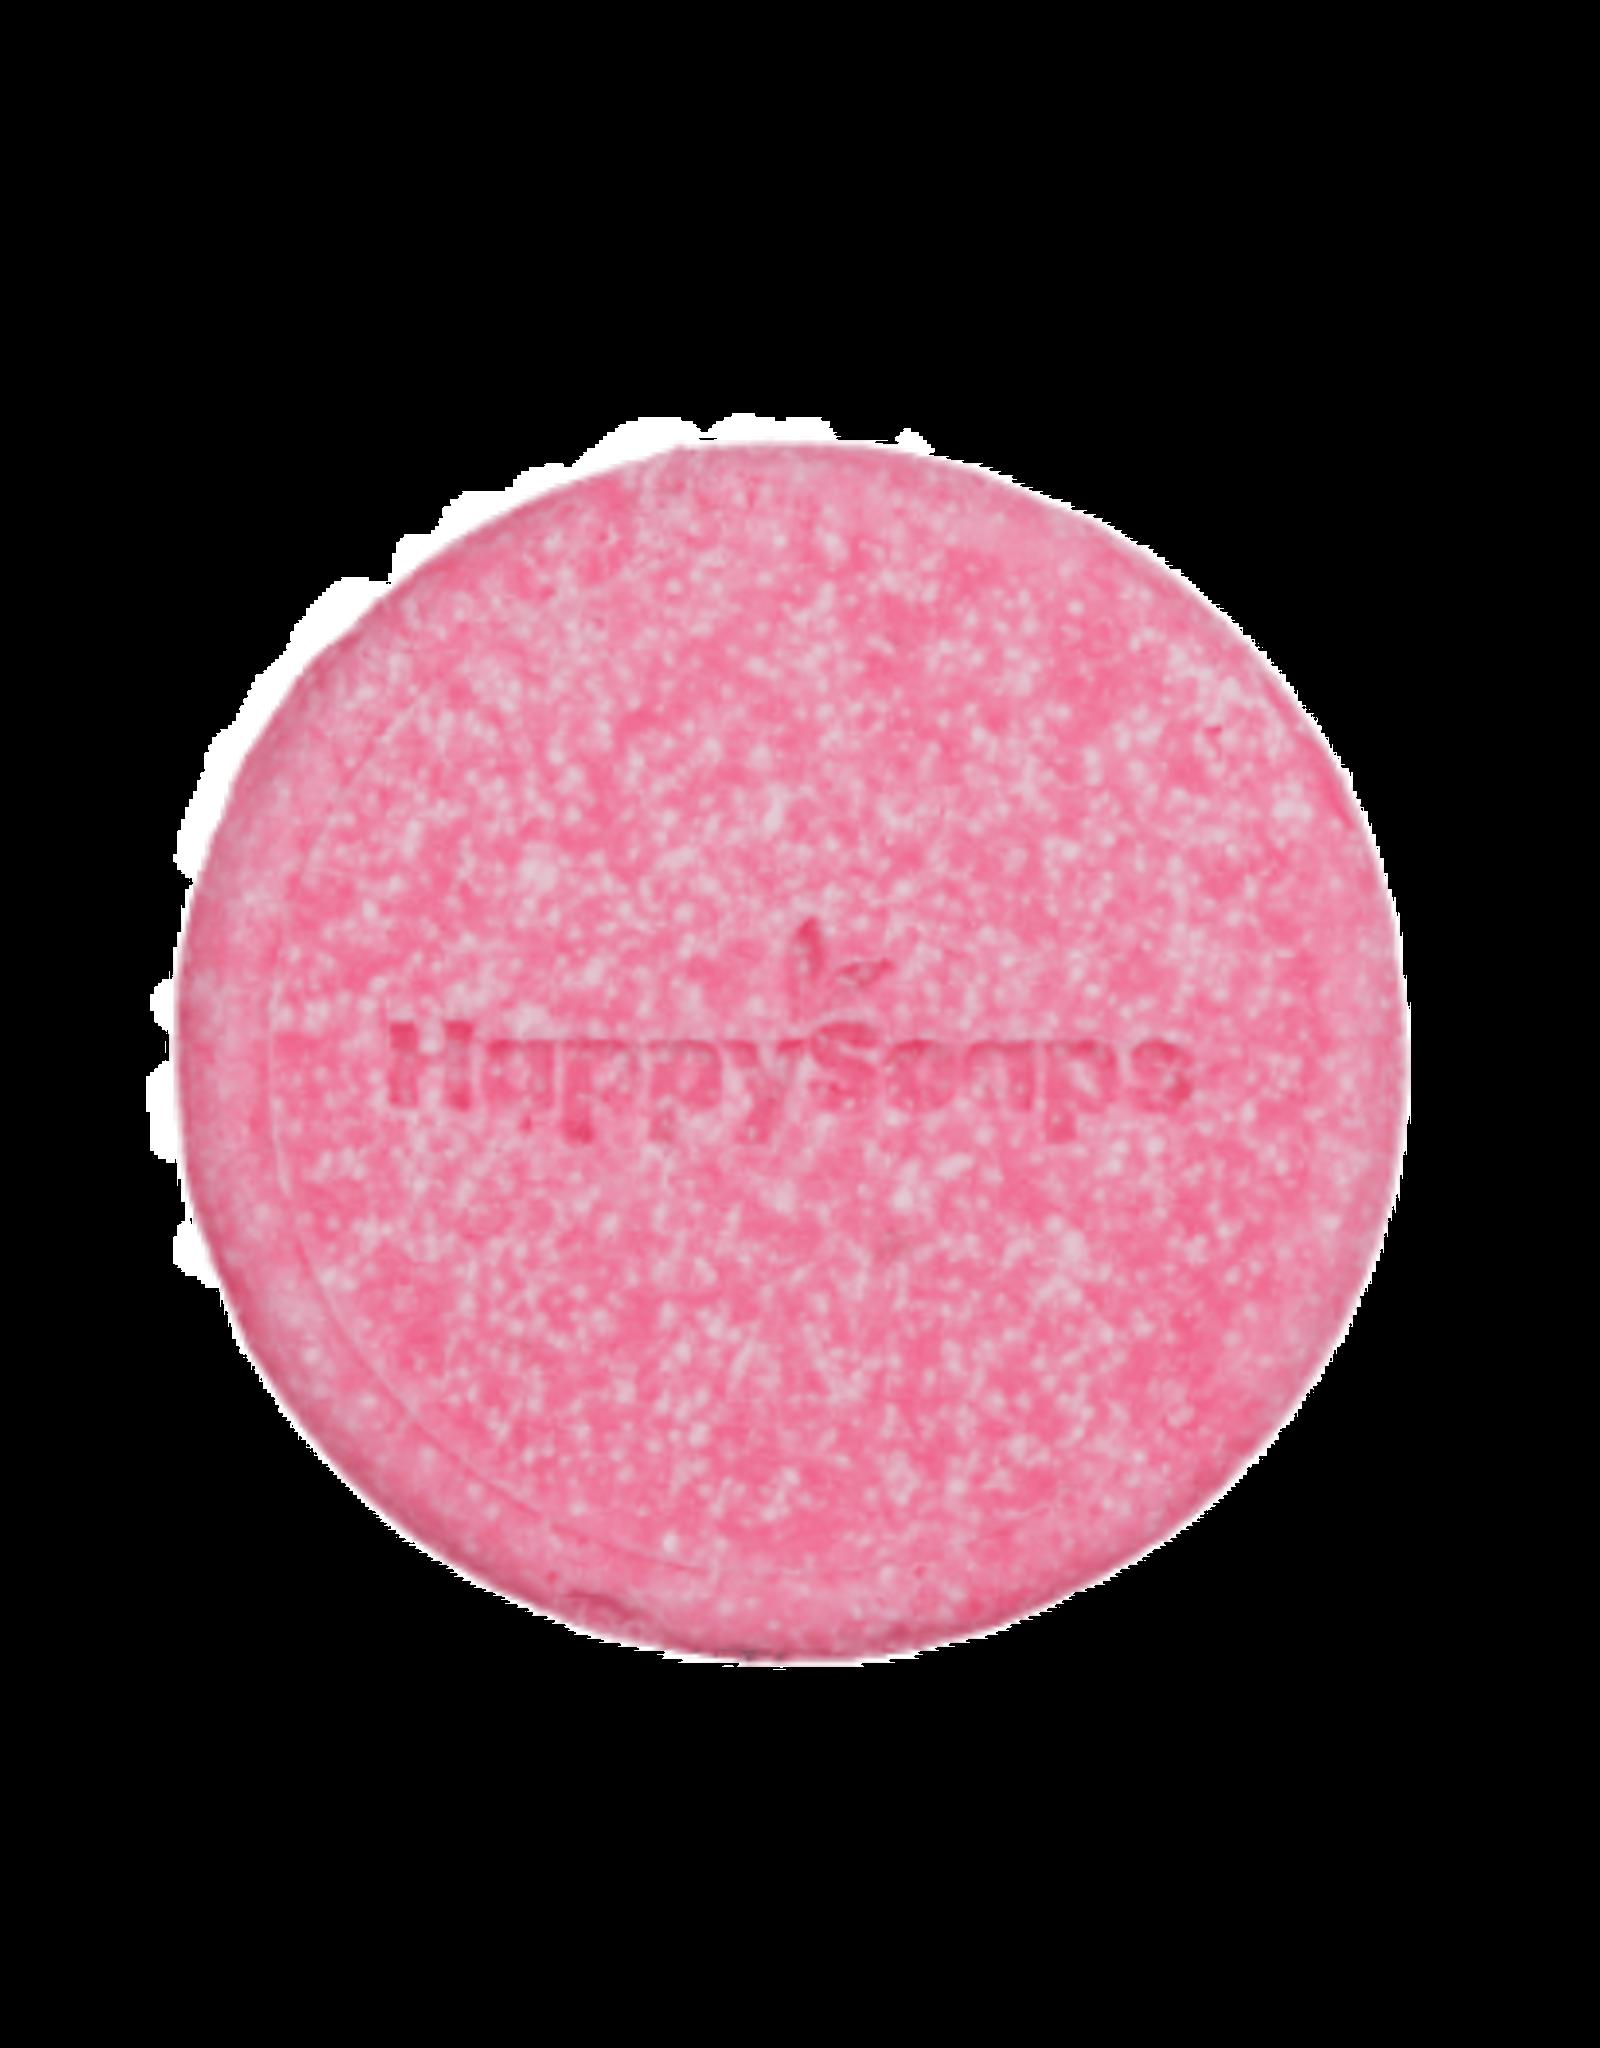 Happy Soaps Shampoo Bar 'La Vie en Rose' - Body & Soap